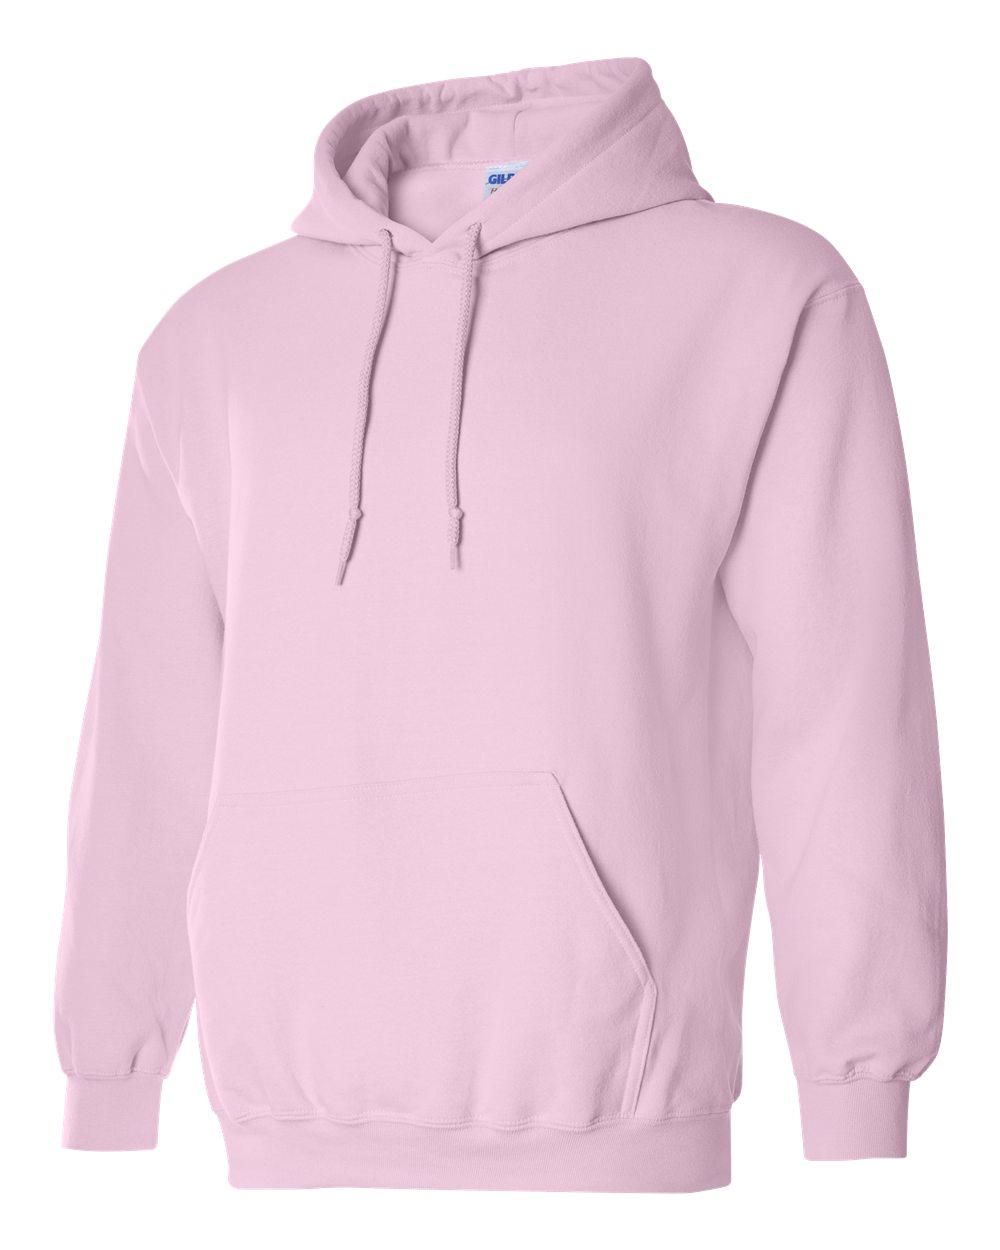 Gildan Heavy Blend Hooded Sweatshirt GI18500 Light Pink